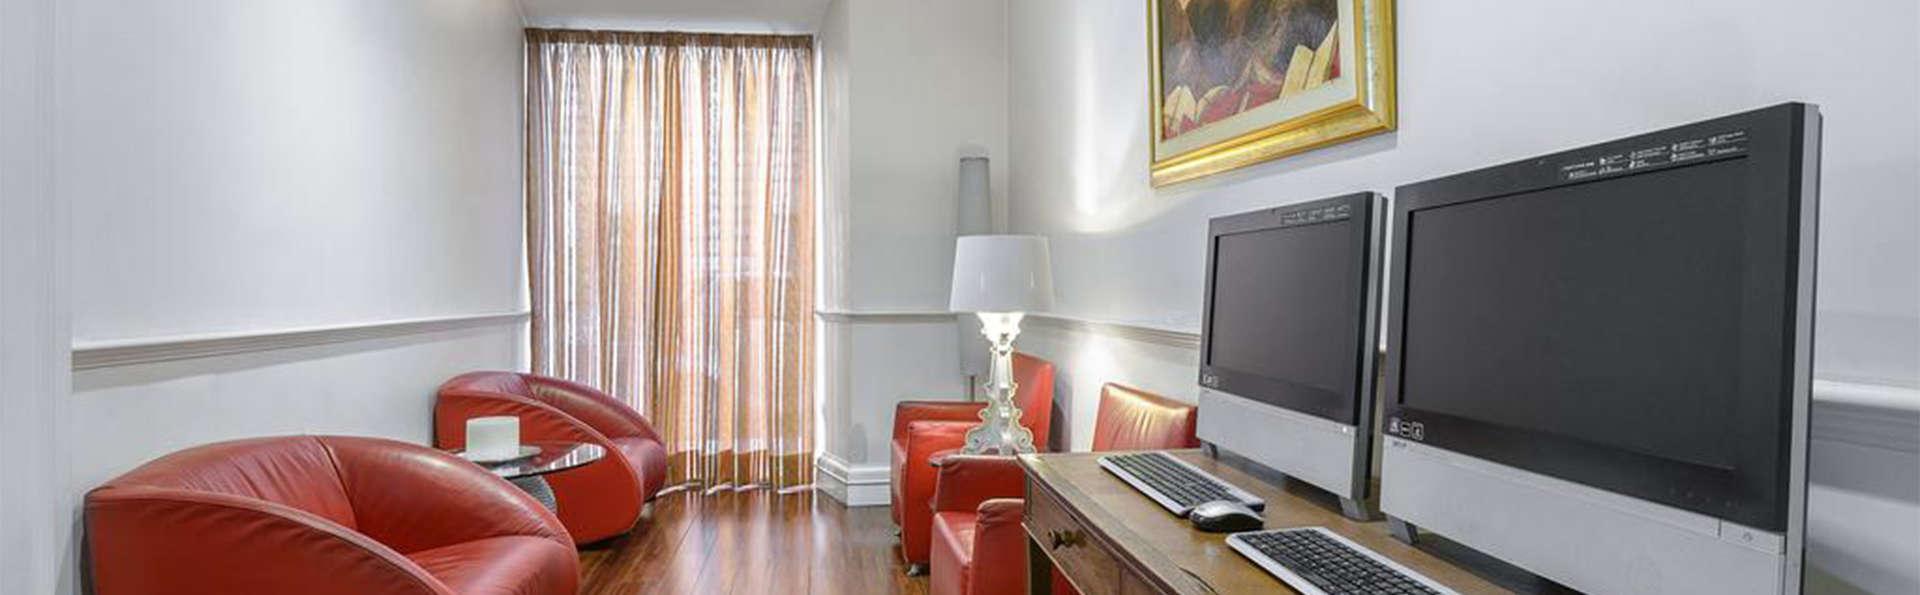 Gambrinus Hotel - EDIT_lobby2.jpg